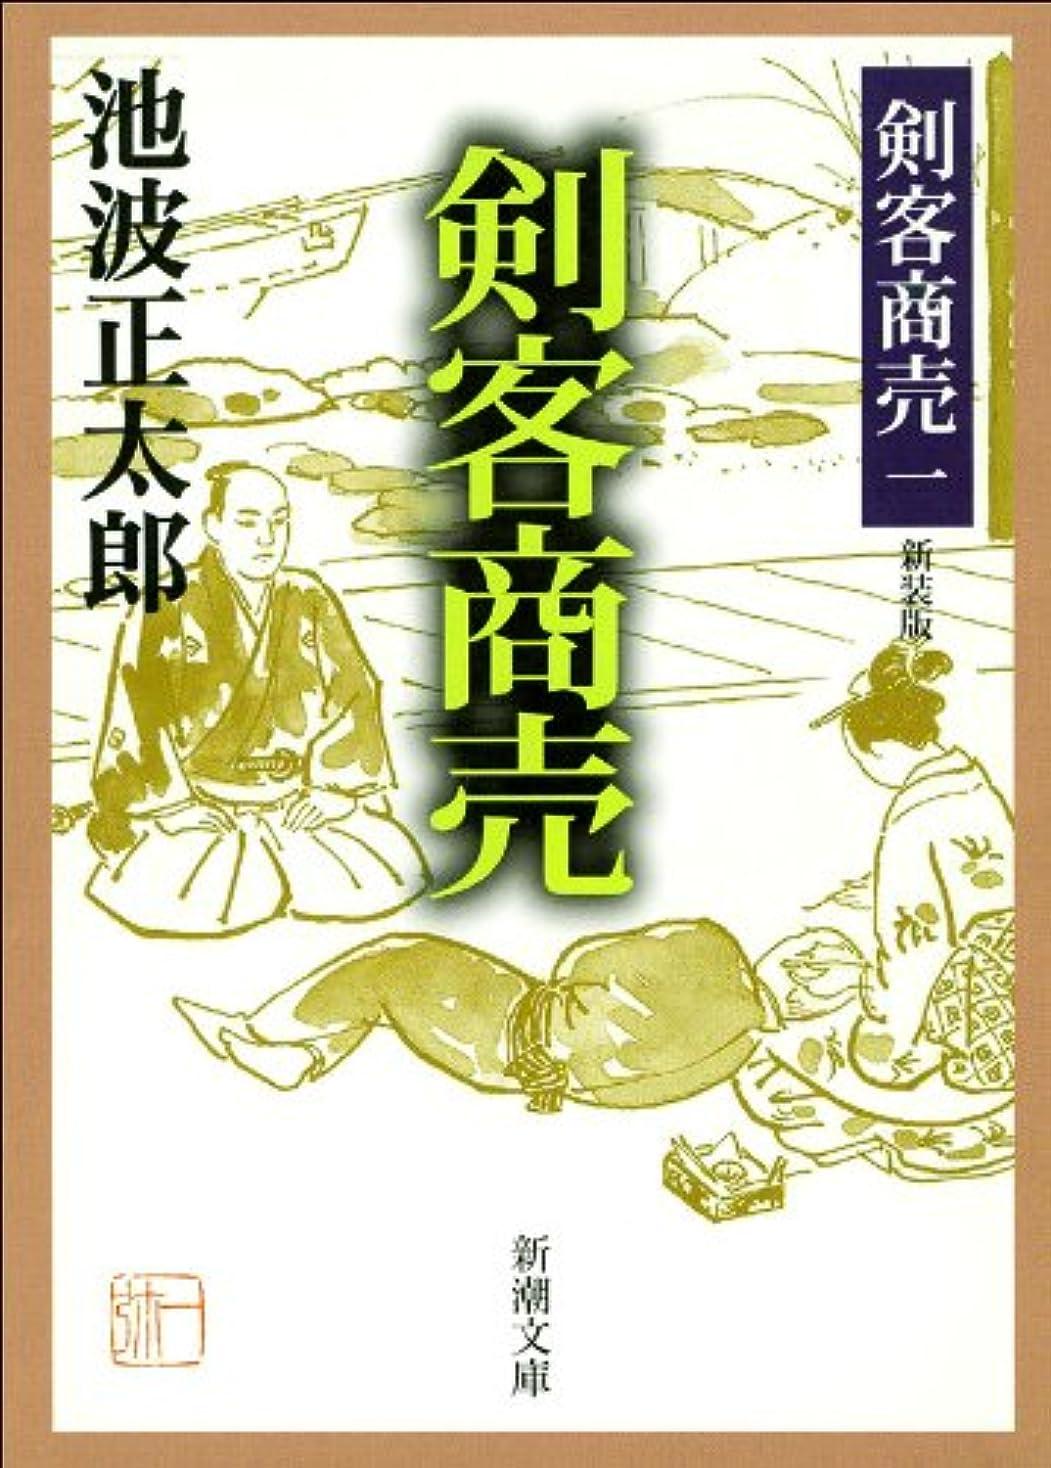 神社ロケット武器剣客商売一 剣客商売(新潮文庫)